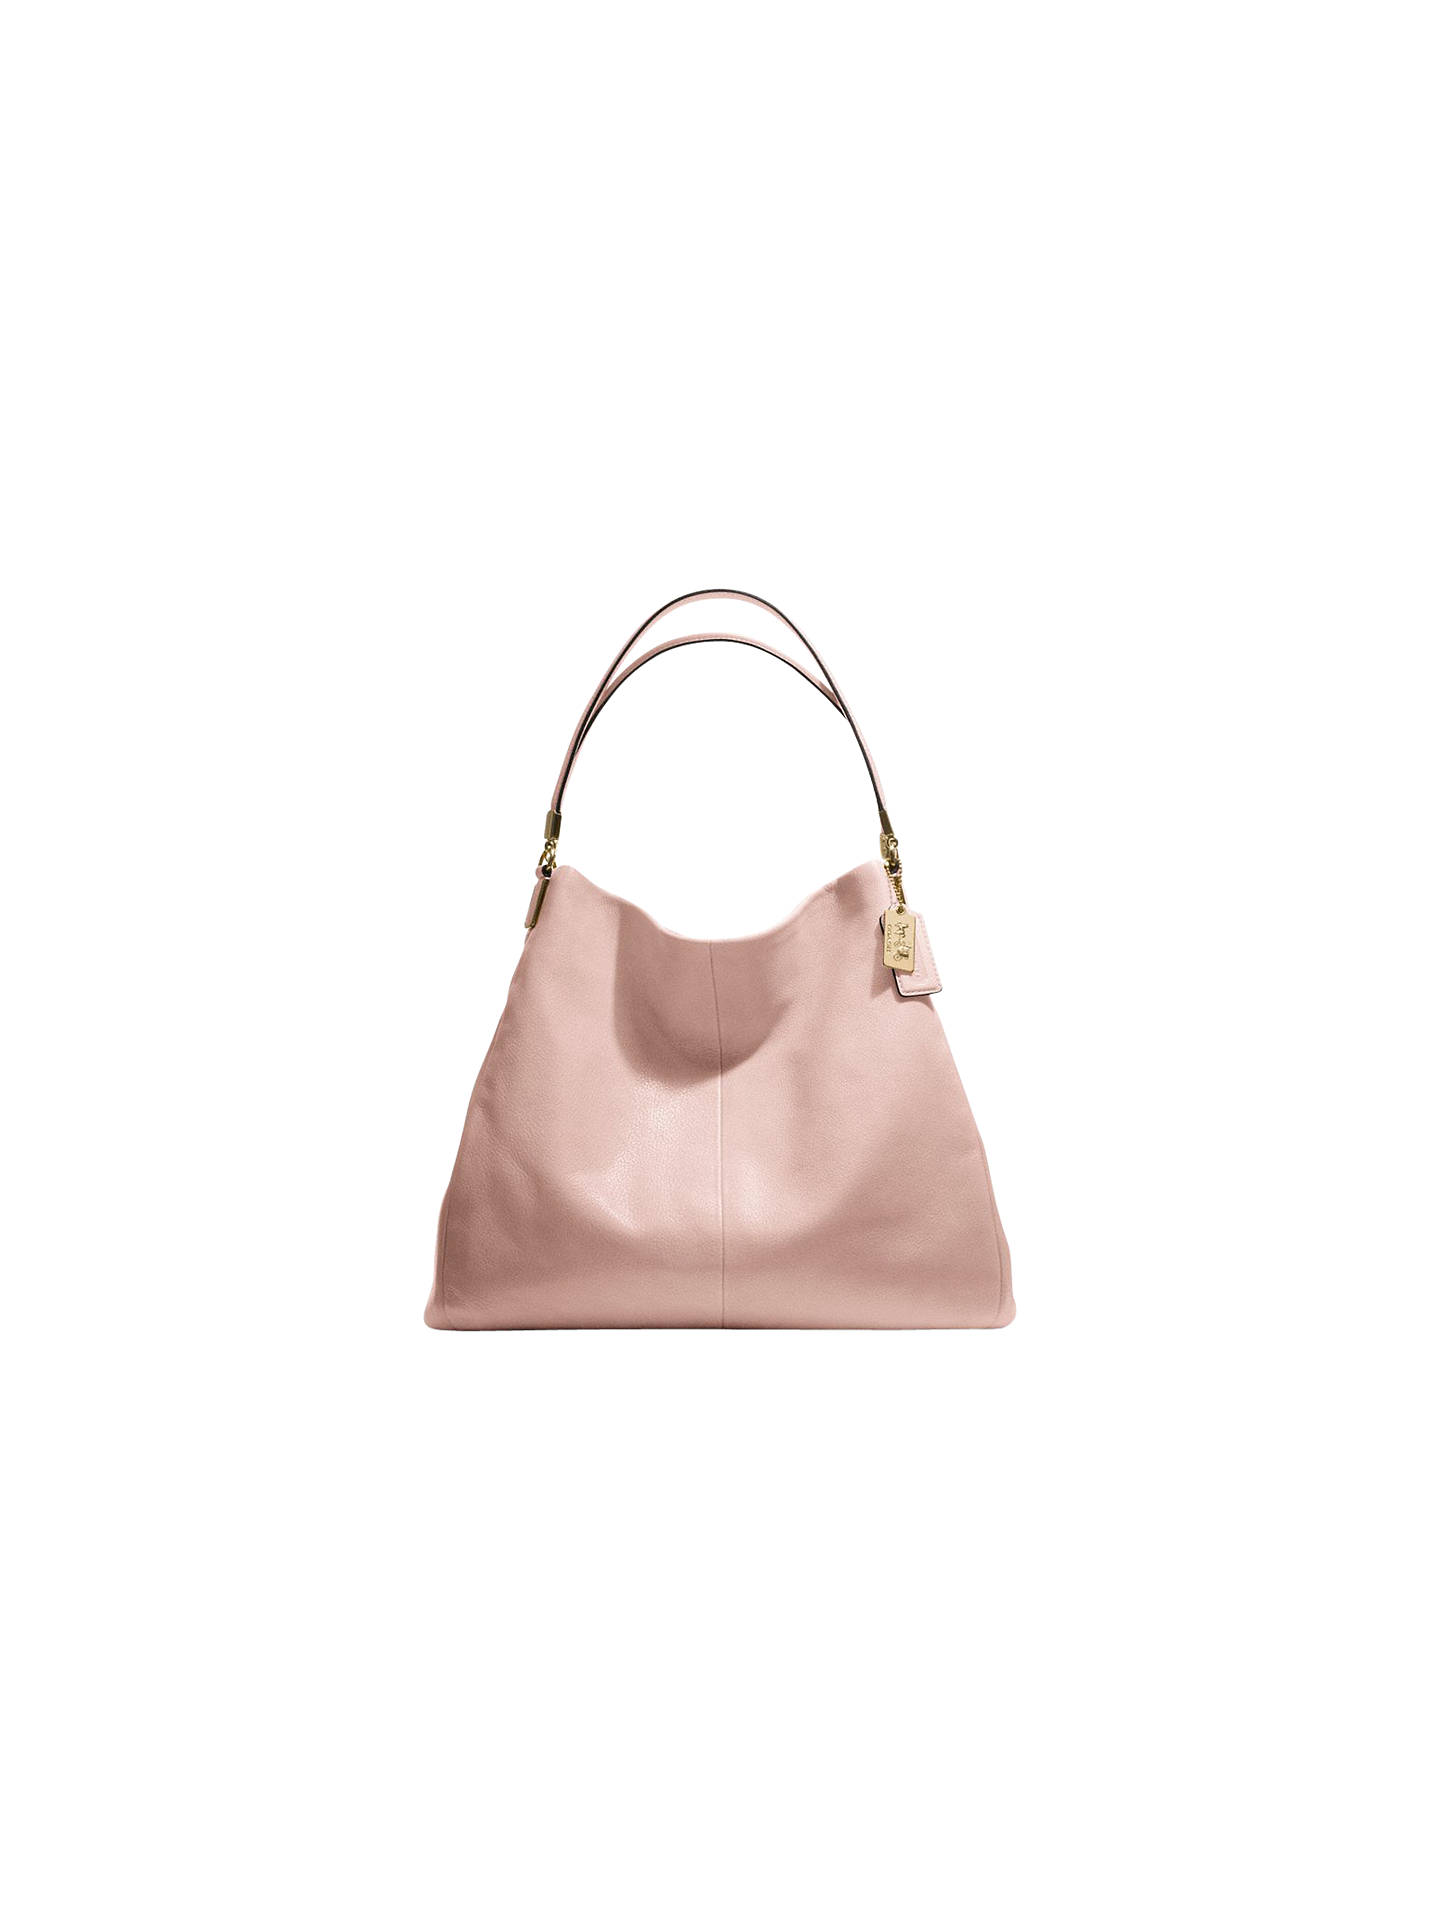 Coach Madison Phoebe Leather Hobo Handbag Peach Online At Johnlewis